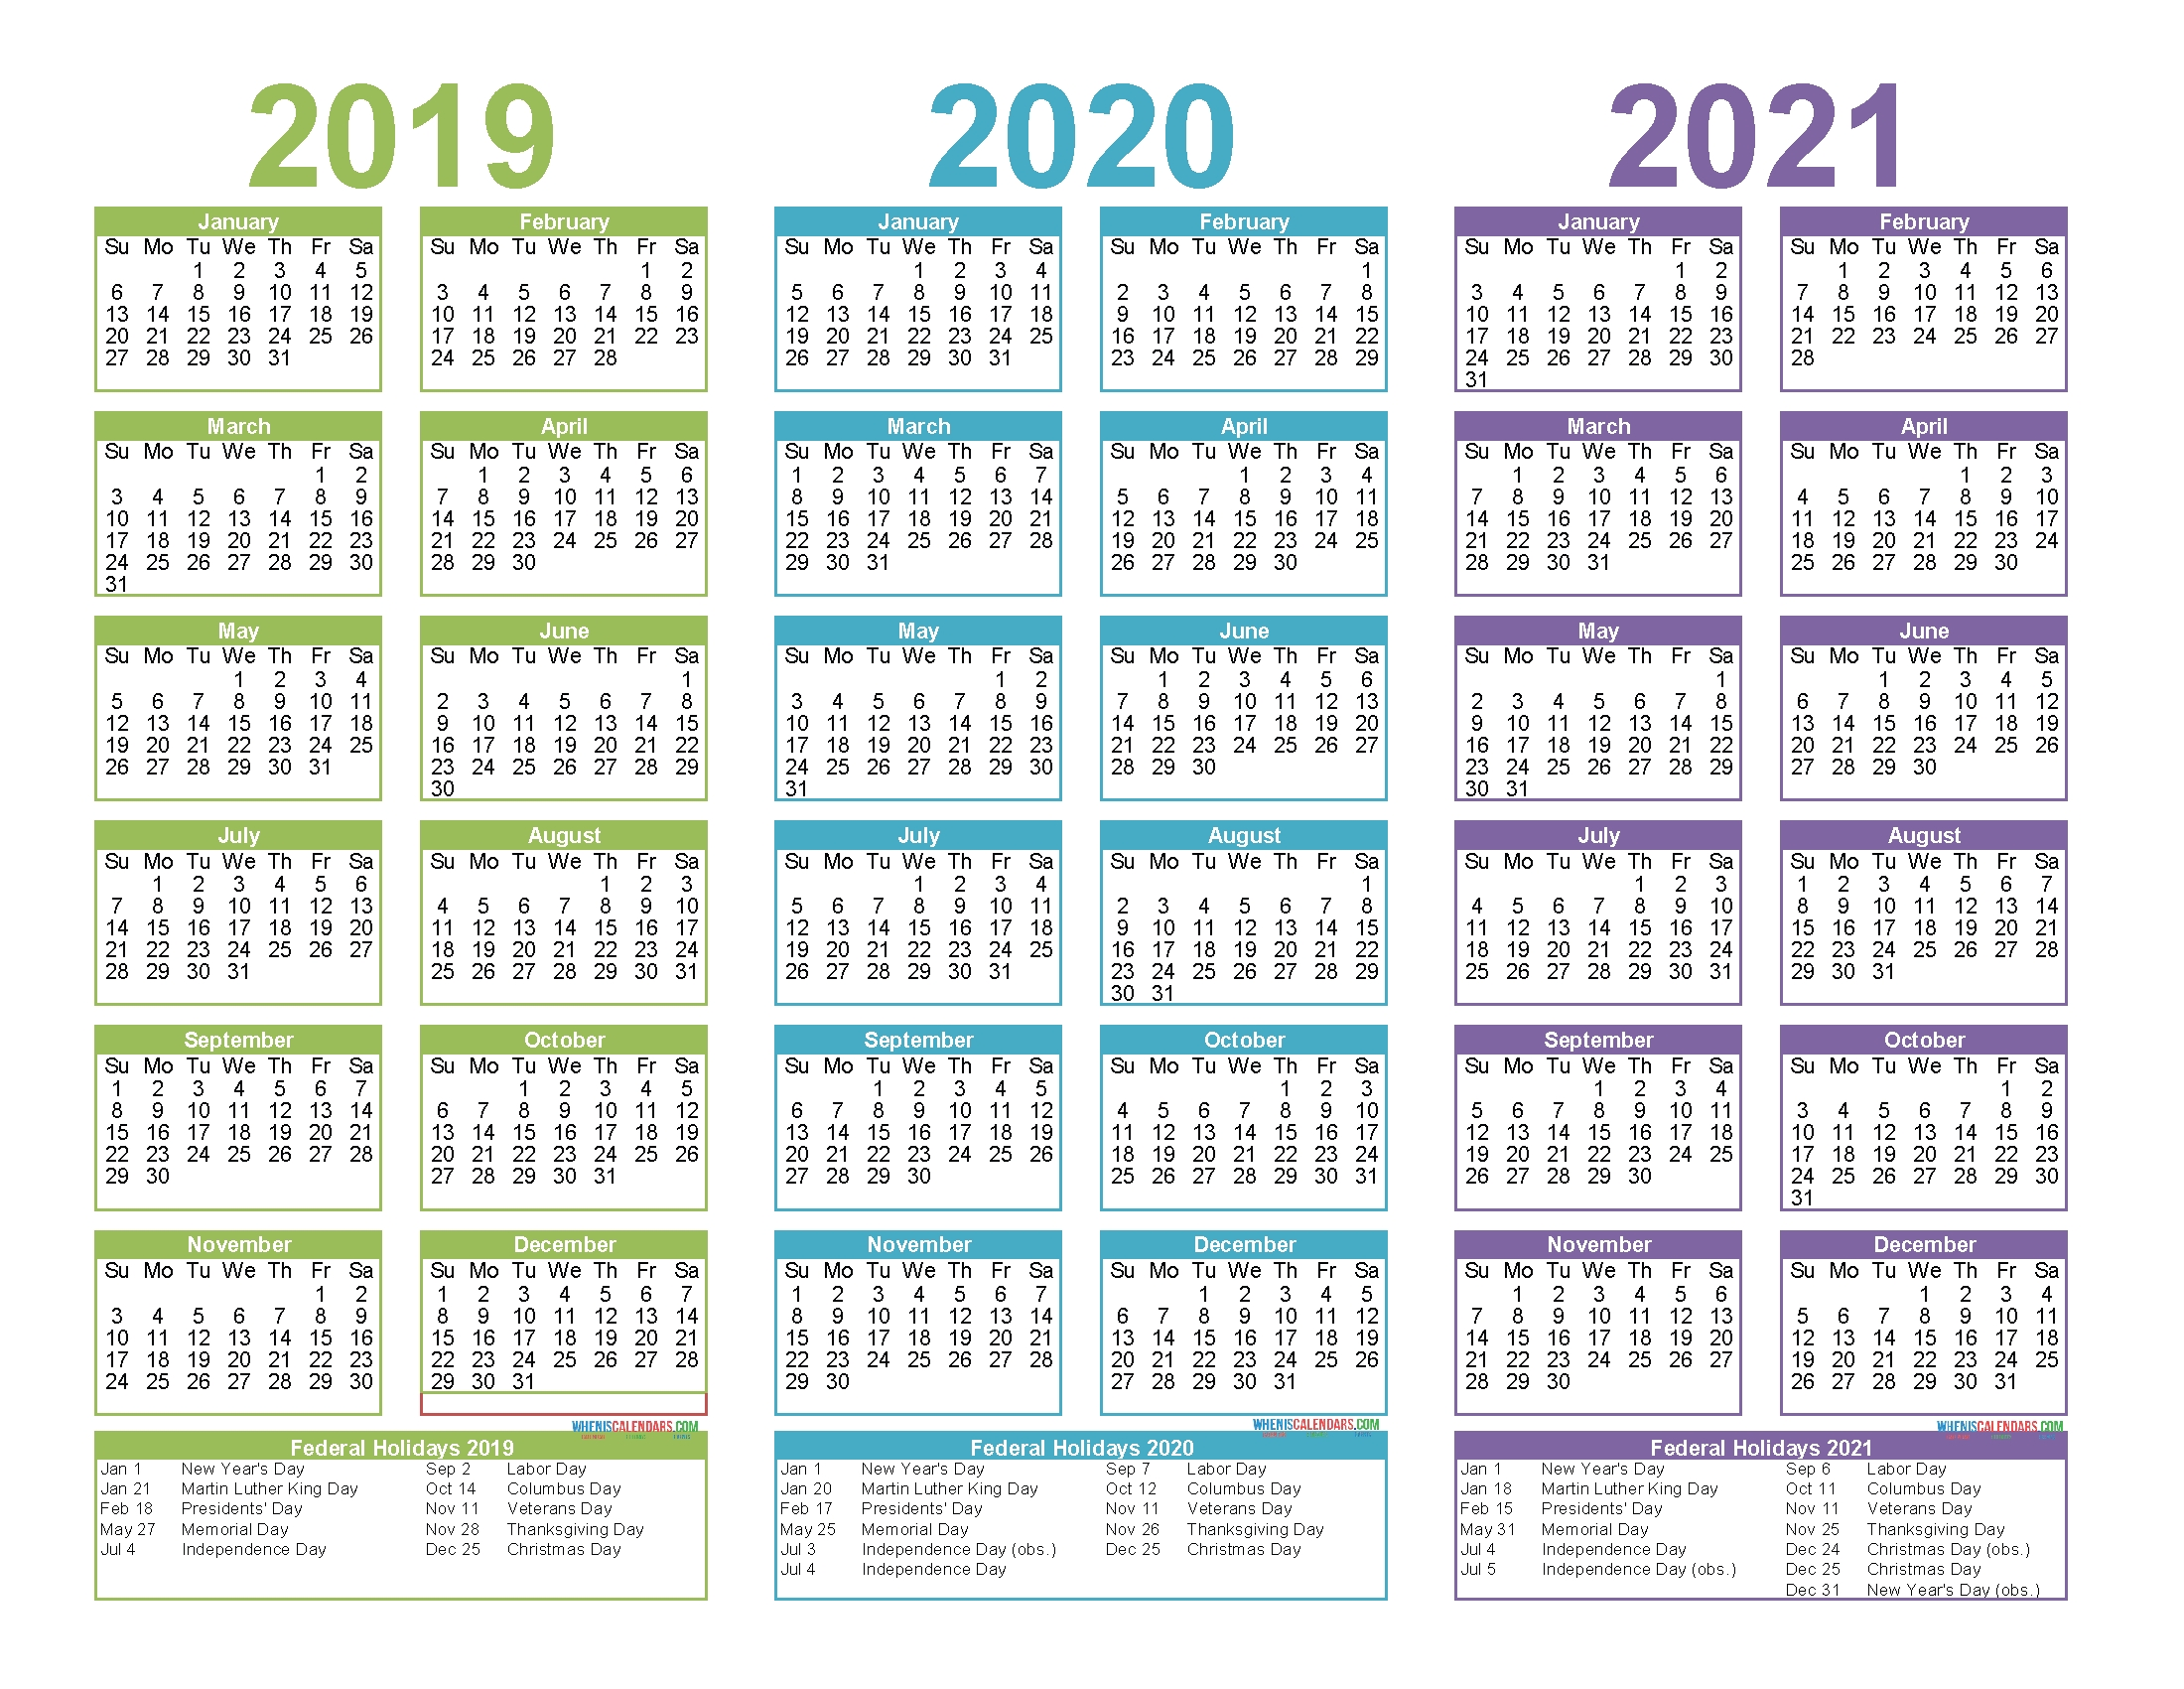 2019 To 2021 3 Year Calendar Printable Free Pdf, Word, Image for 3 Year Calendar Printable 2019 2020 2021